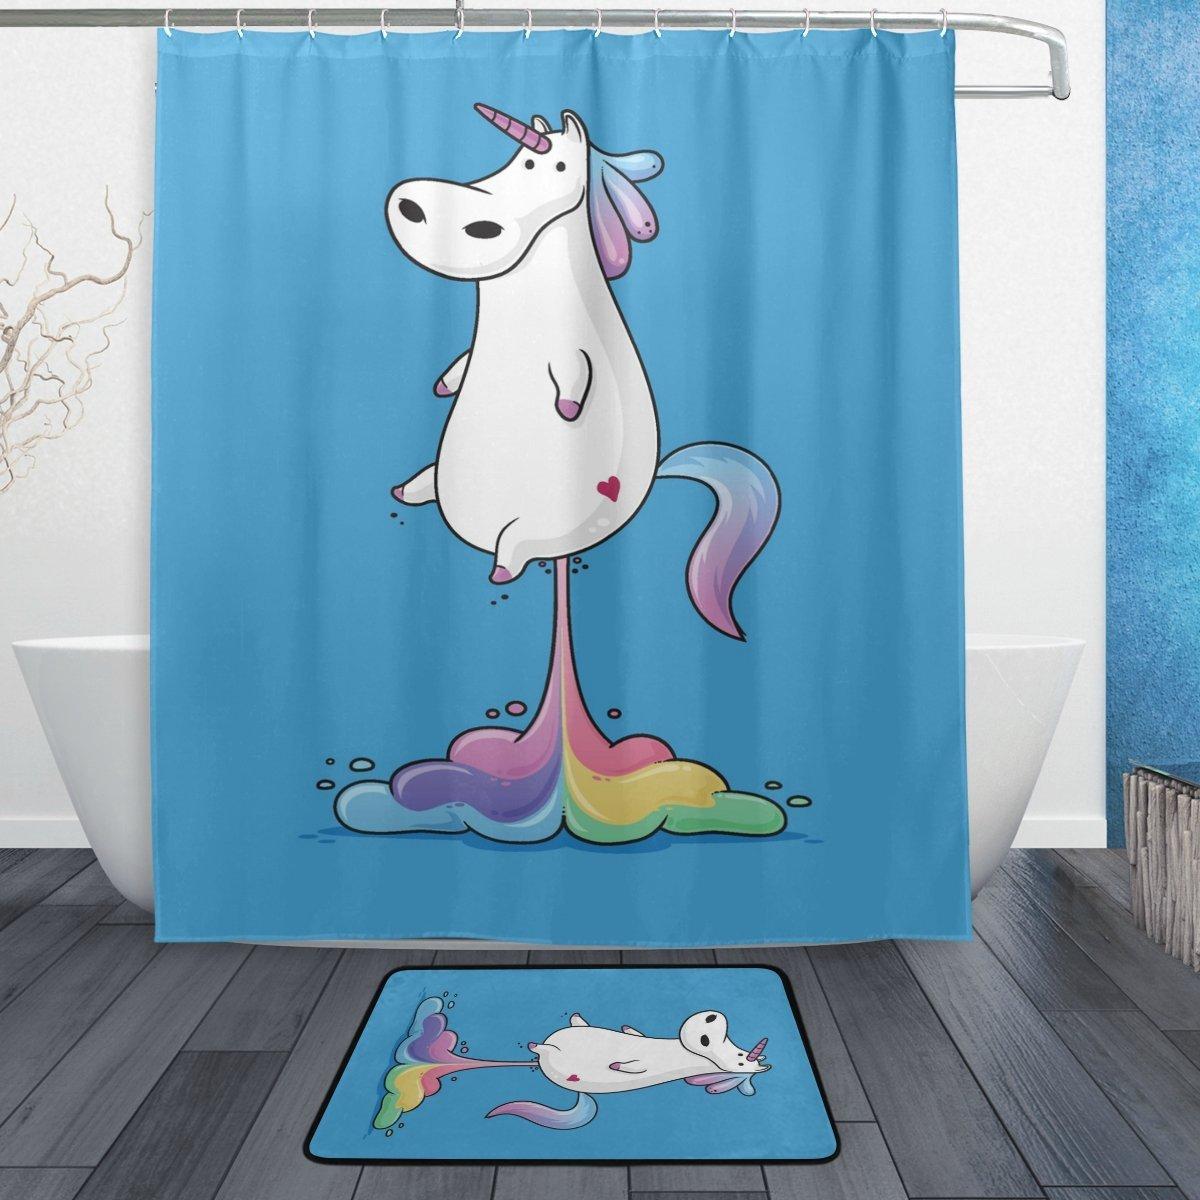 watercolor hippopotamus bathroom shower curtain waterproof fabric w 12 hooks